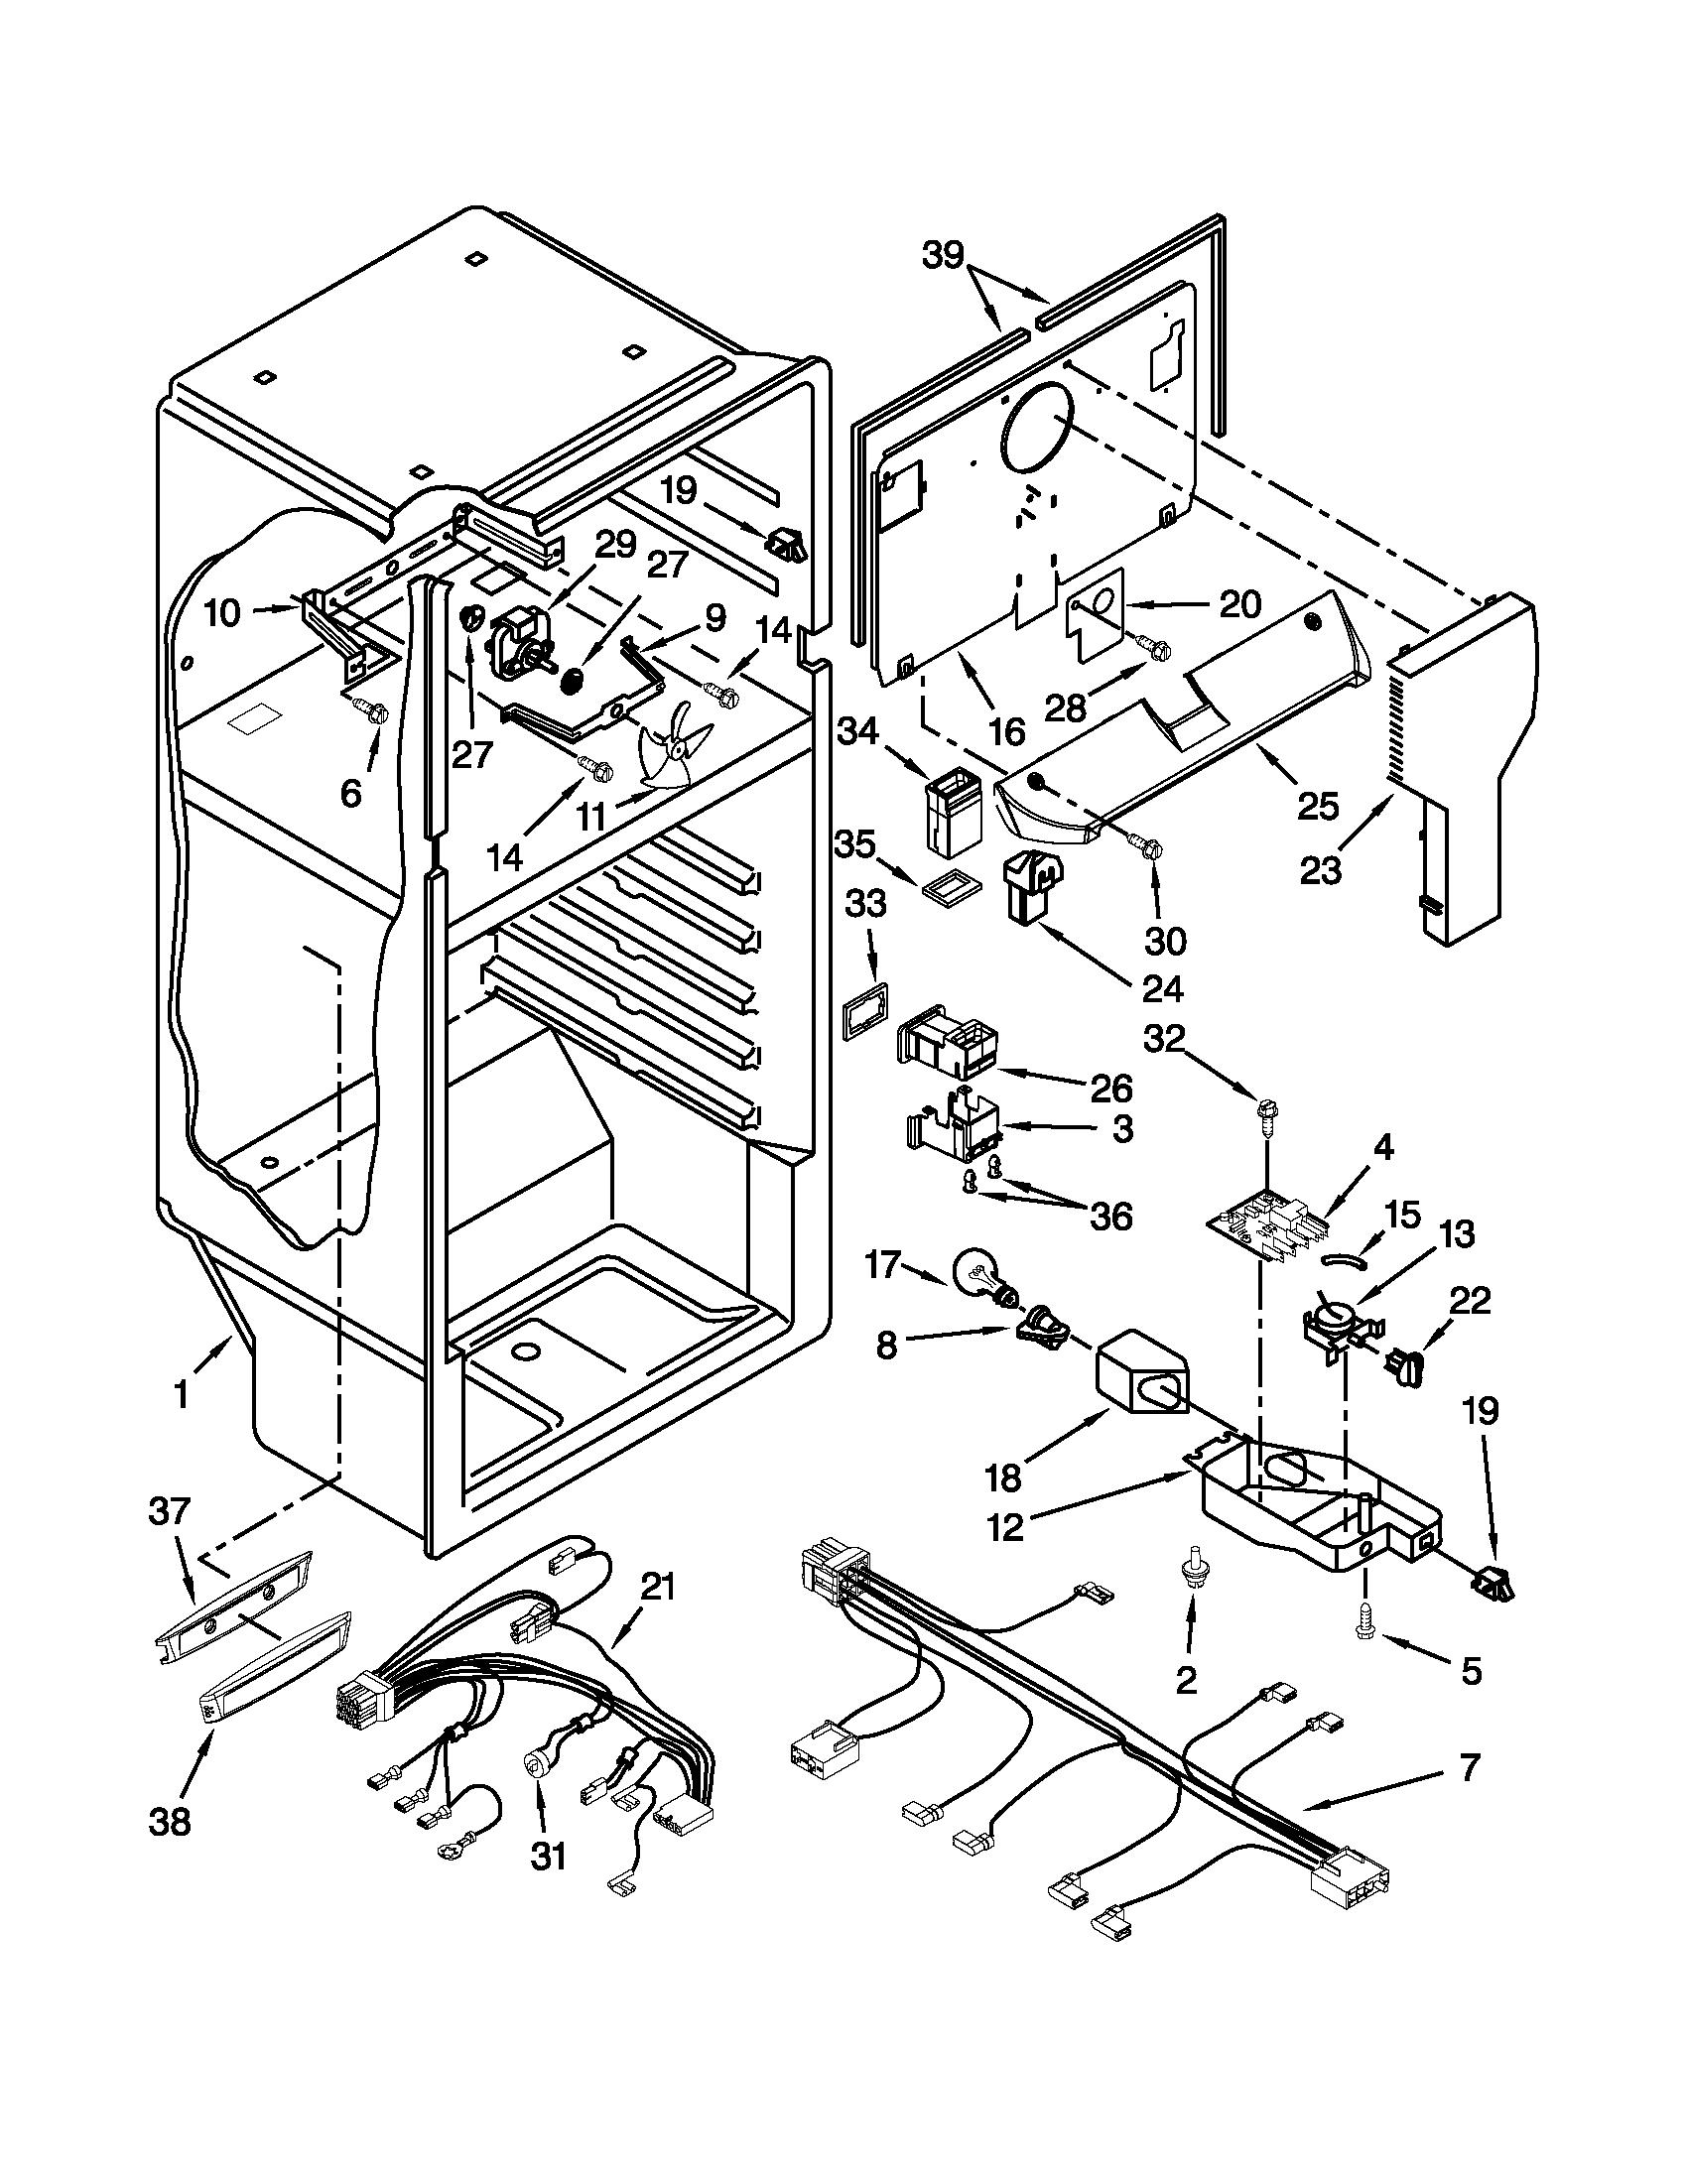 LINER PARTS Diagram & Parts List for Model w8rxngmbb00